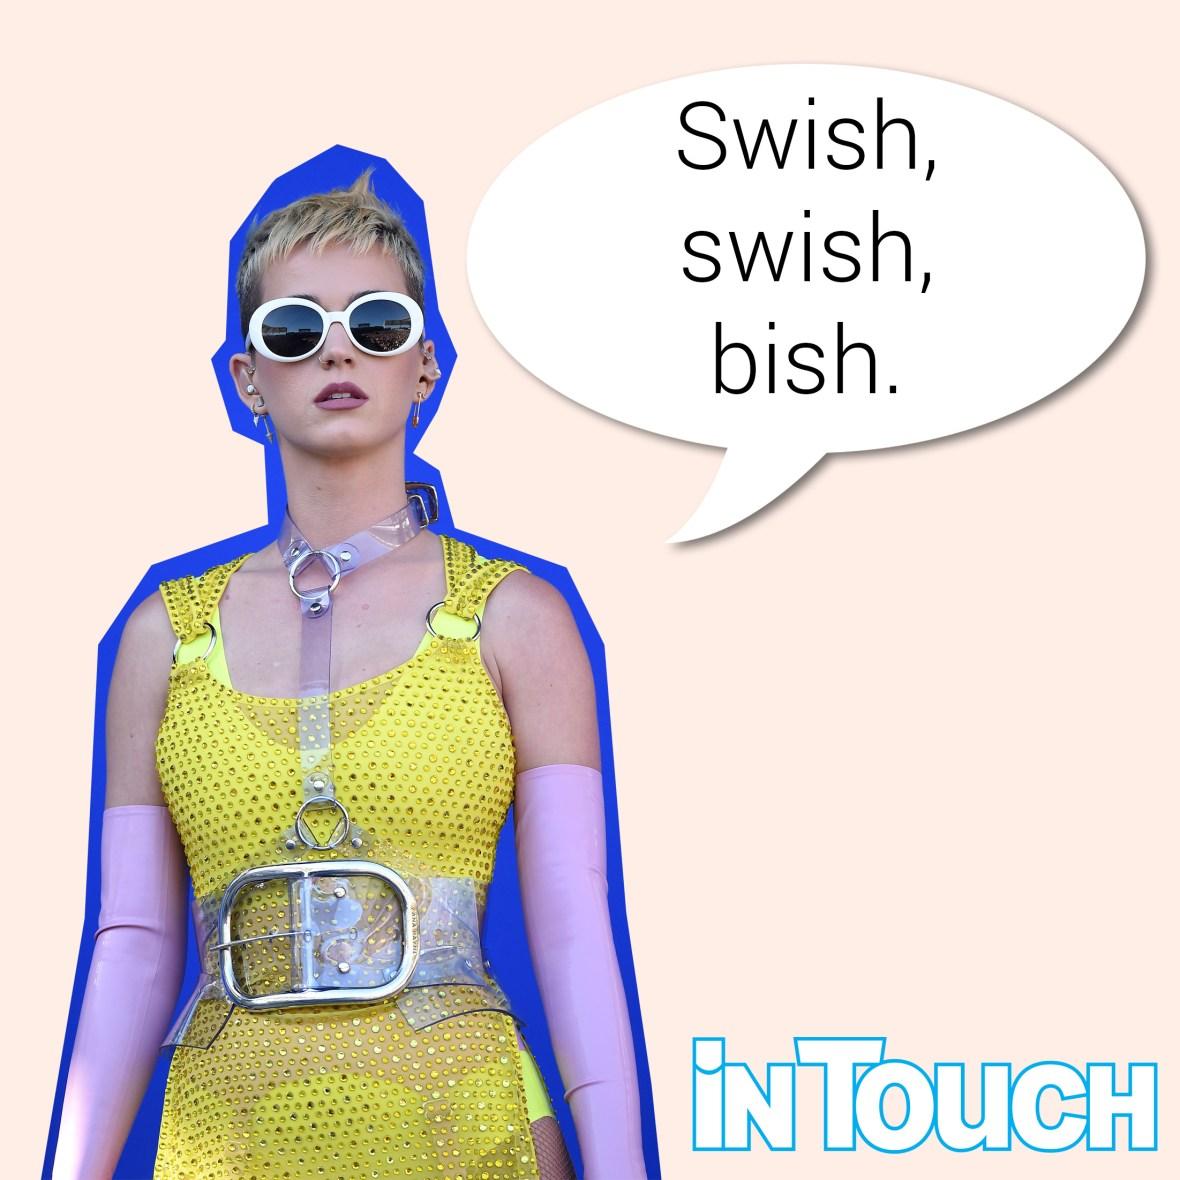 katy perry swish swish lyrics 4